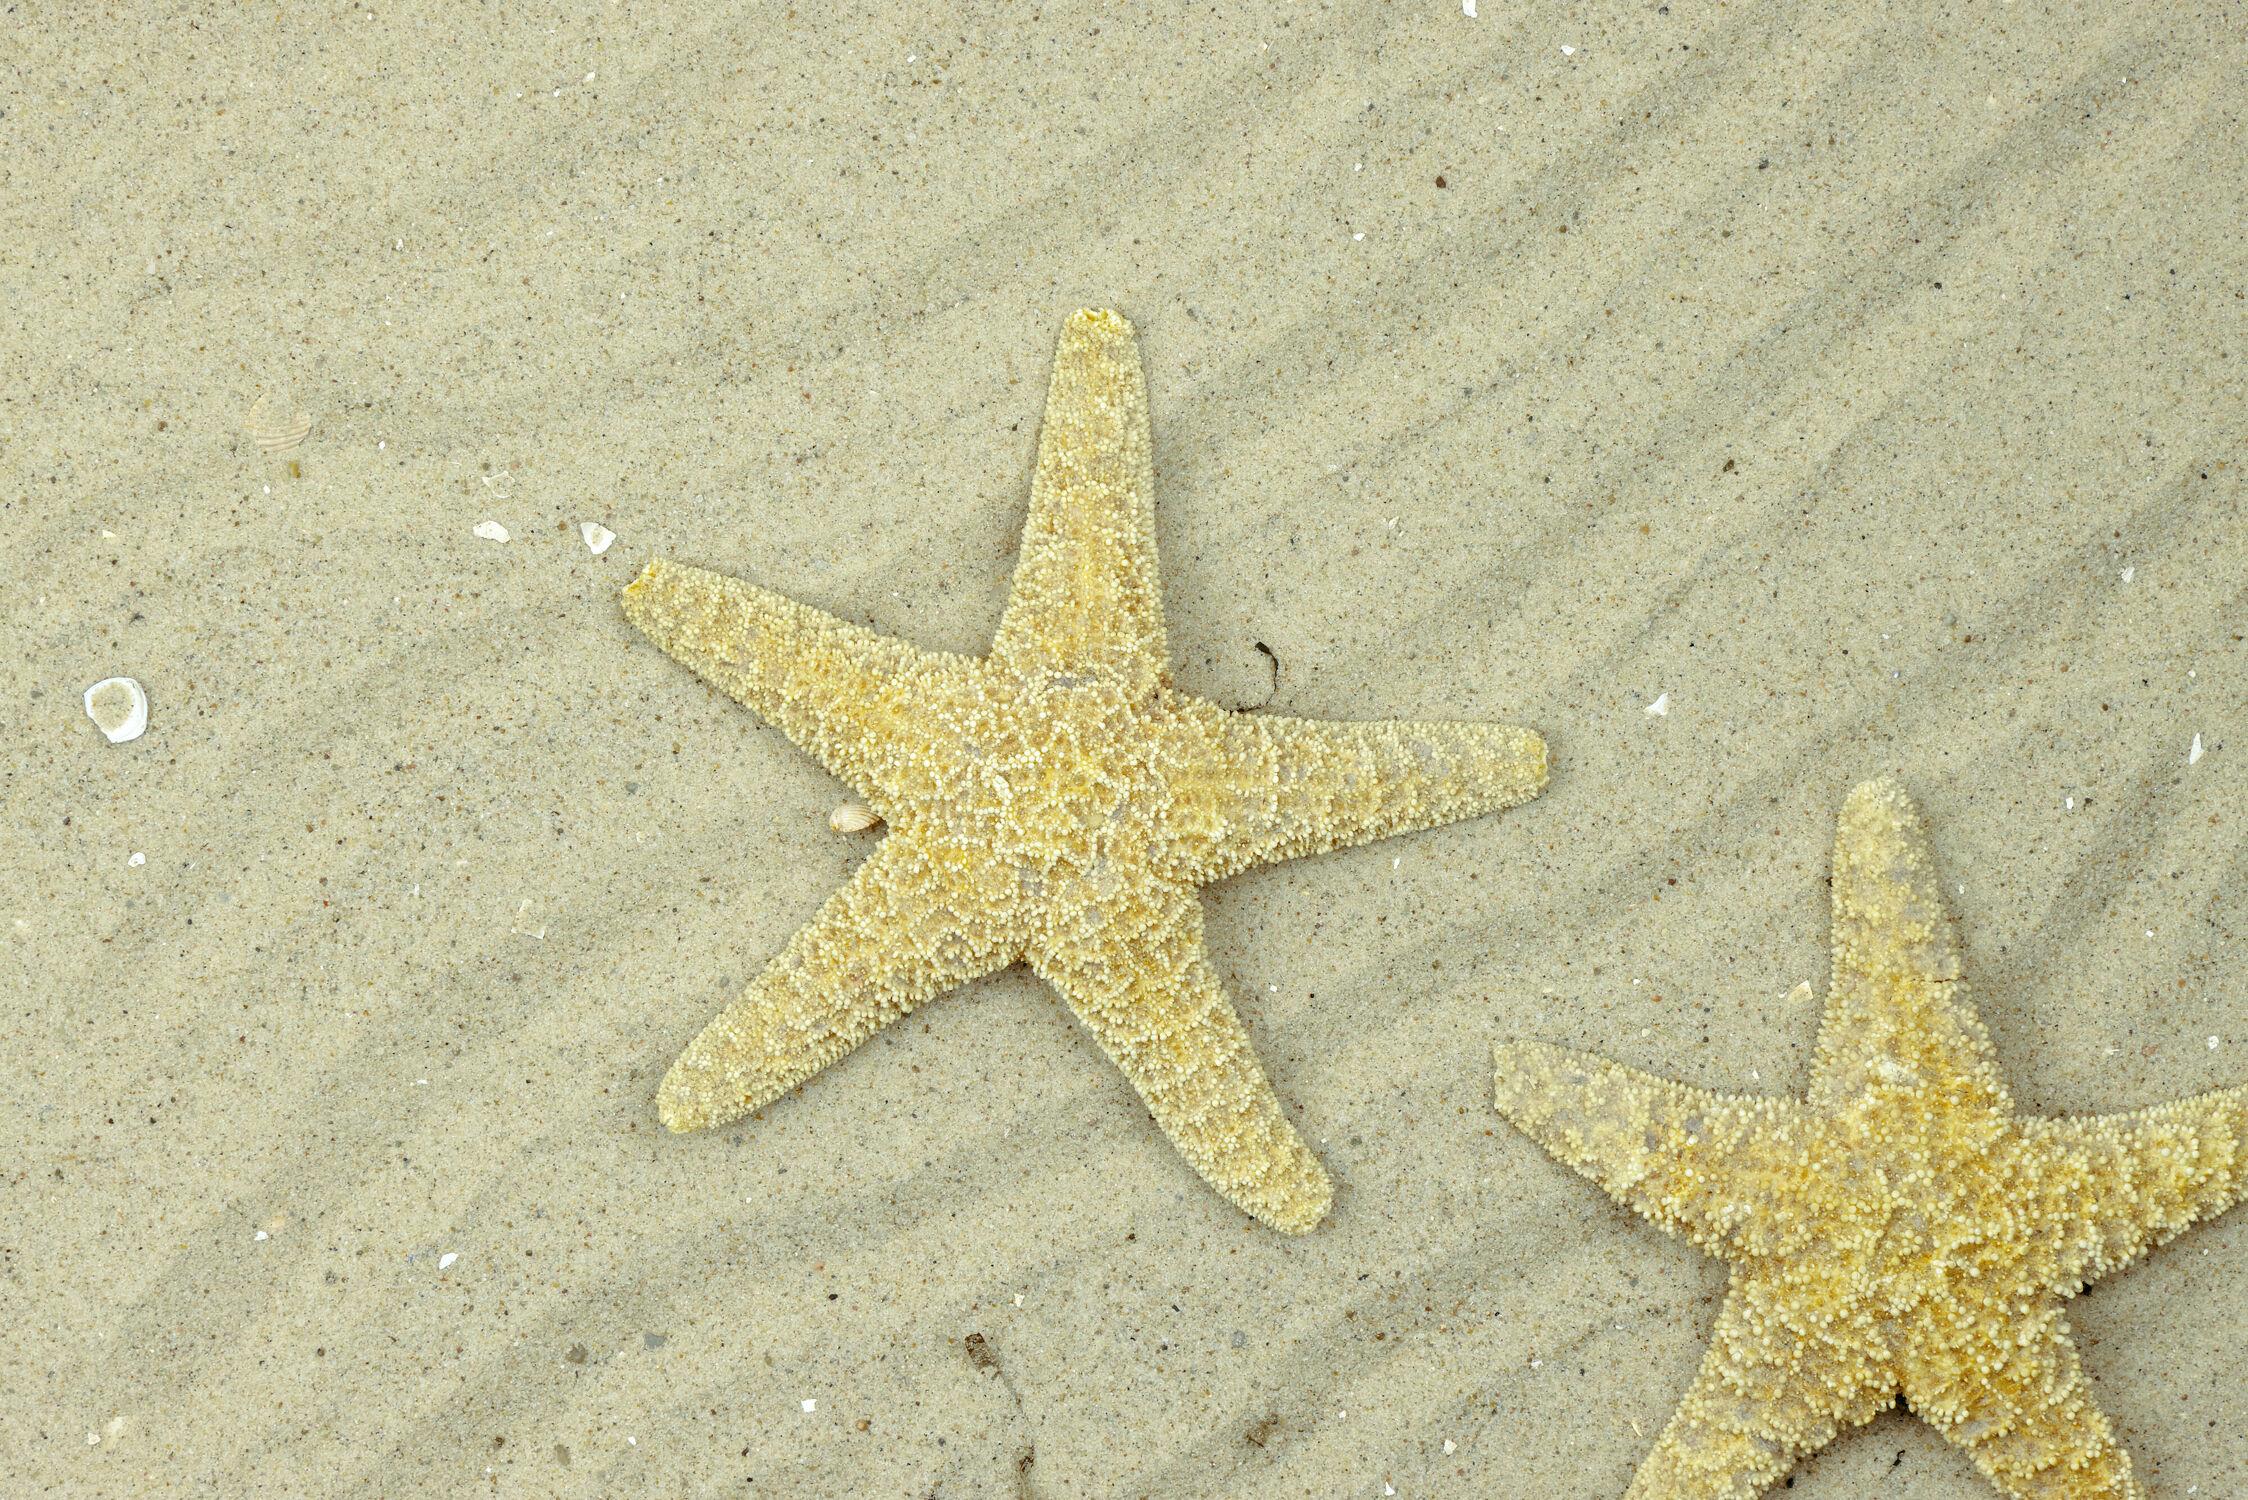 Bild mit Sand, Sandstrand, Strandbild, Seestern, Seesterne, Wellness, Spa